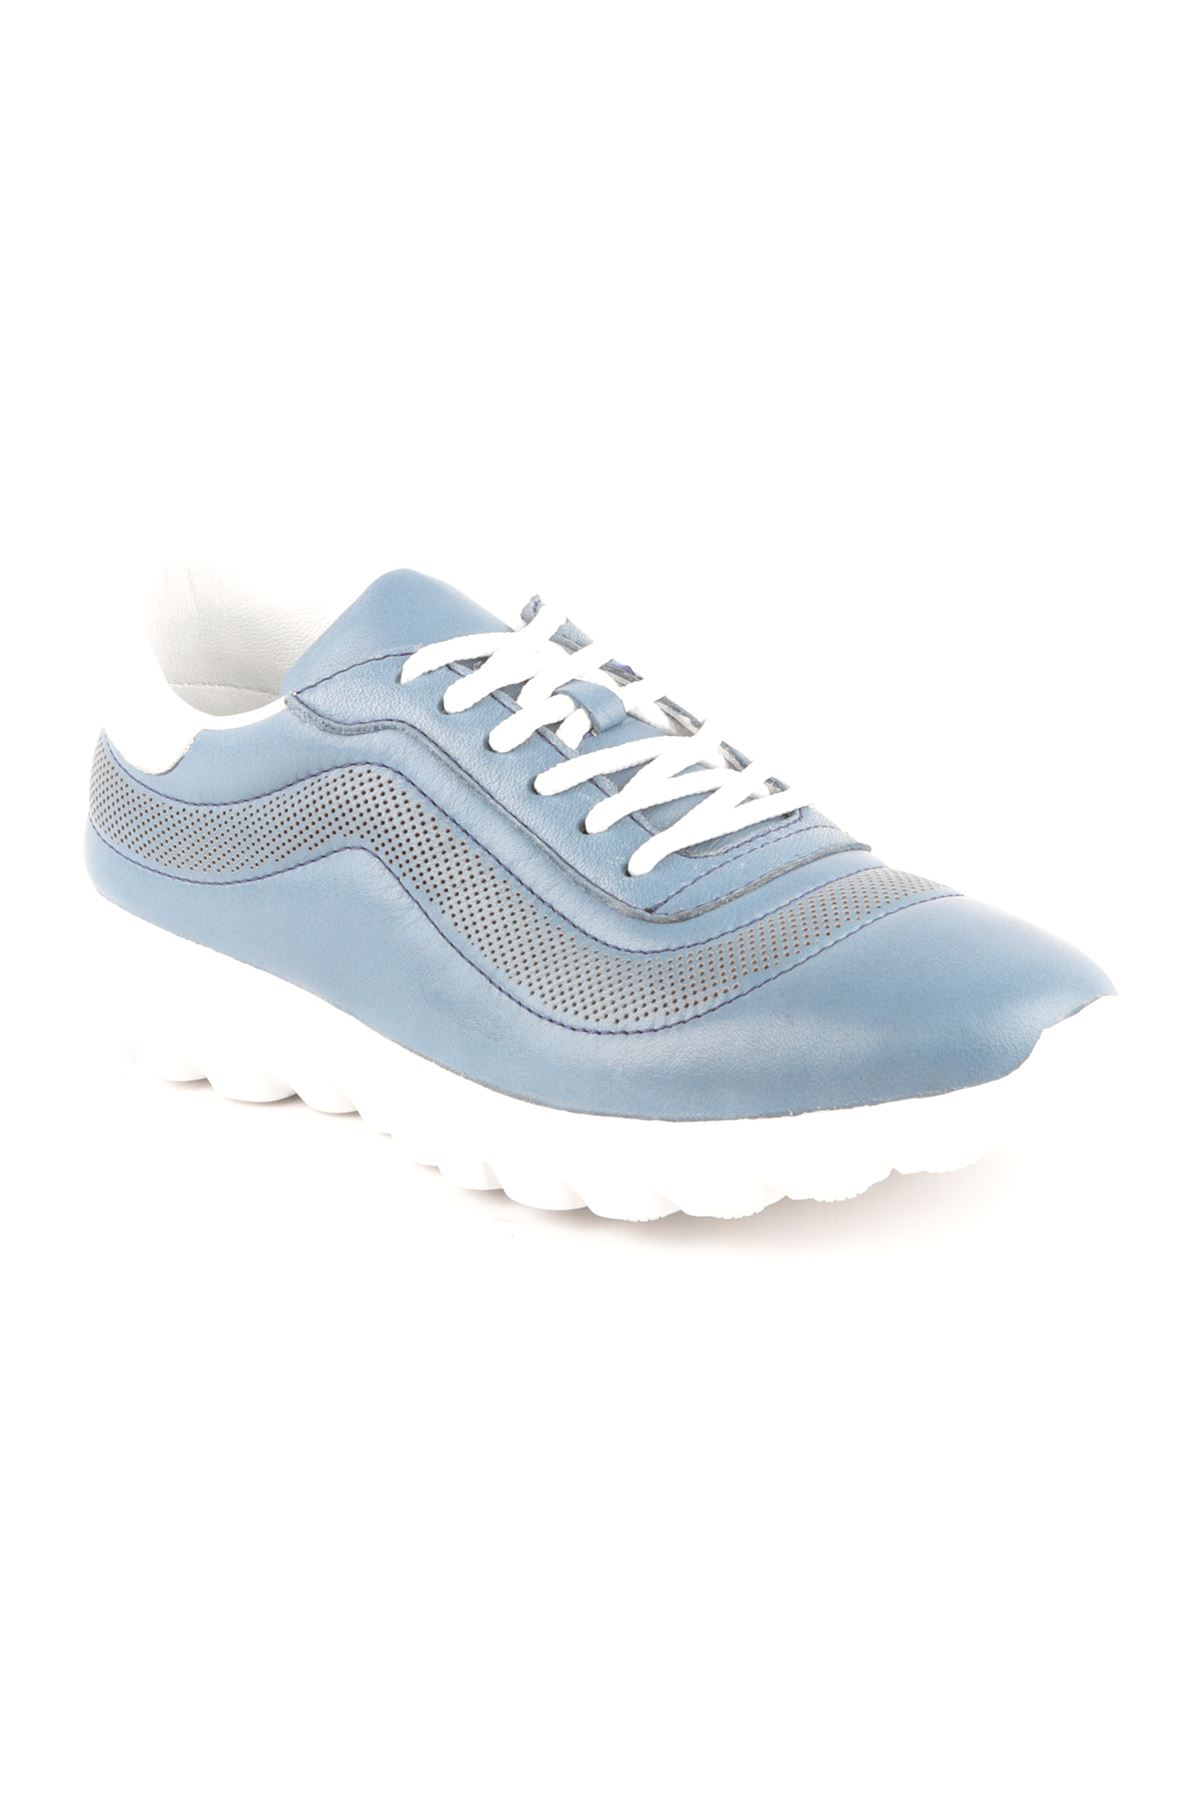 Libero Dİ3777 Mavi Spor Ayakkabı